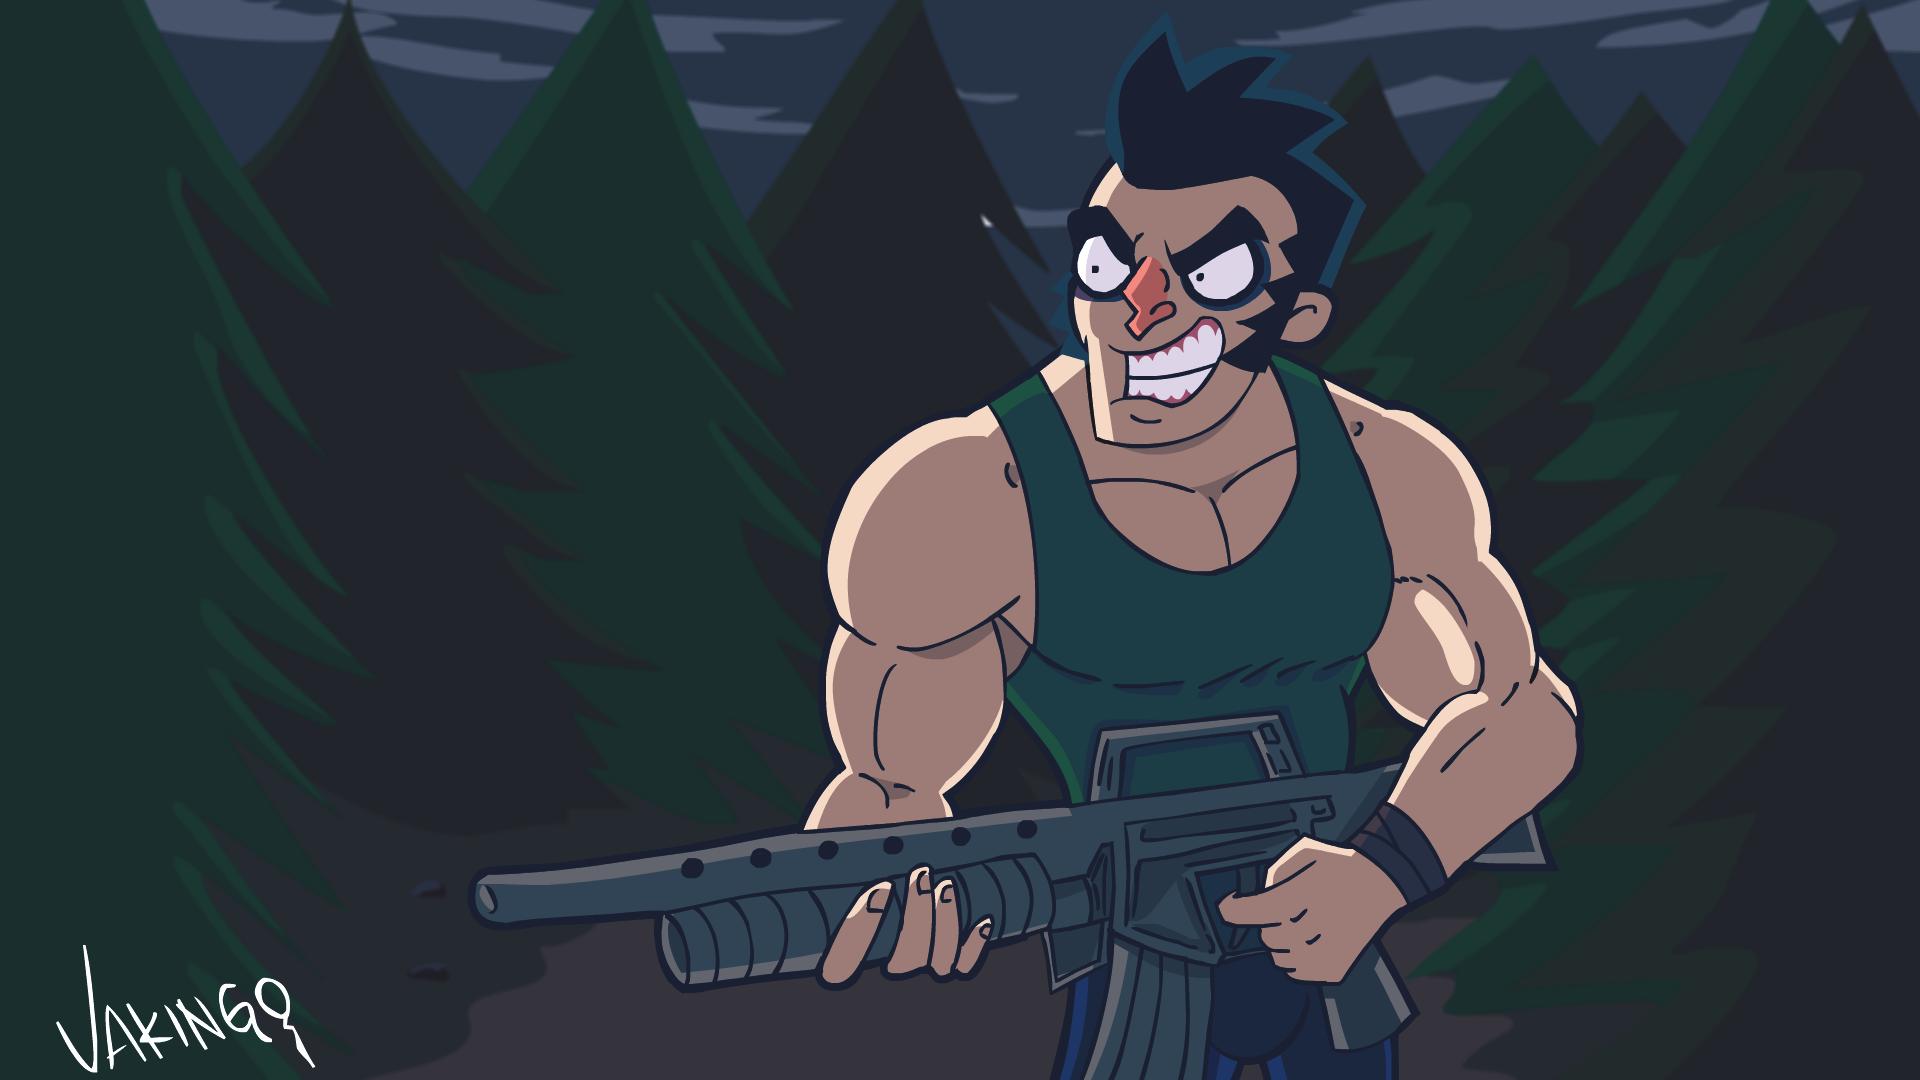 Larry goes hunting FANART